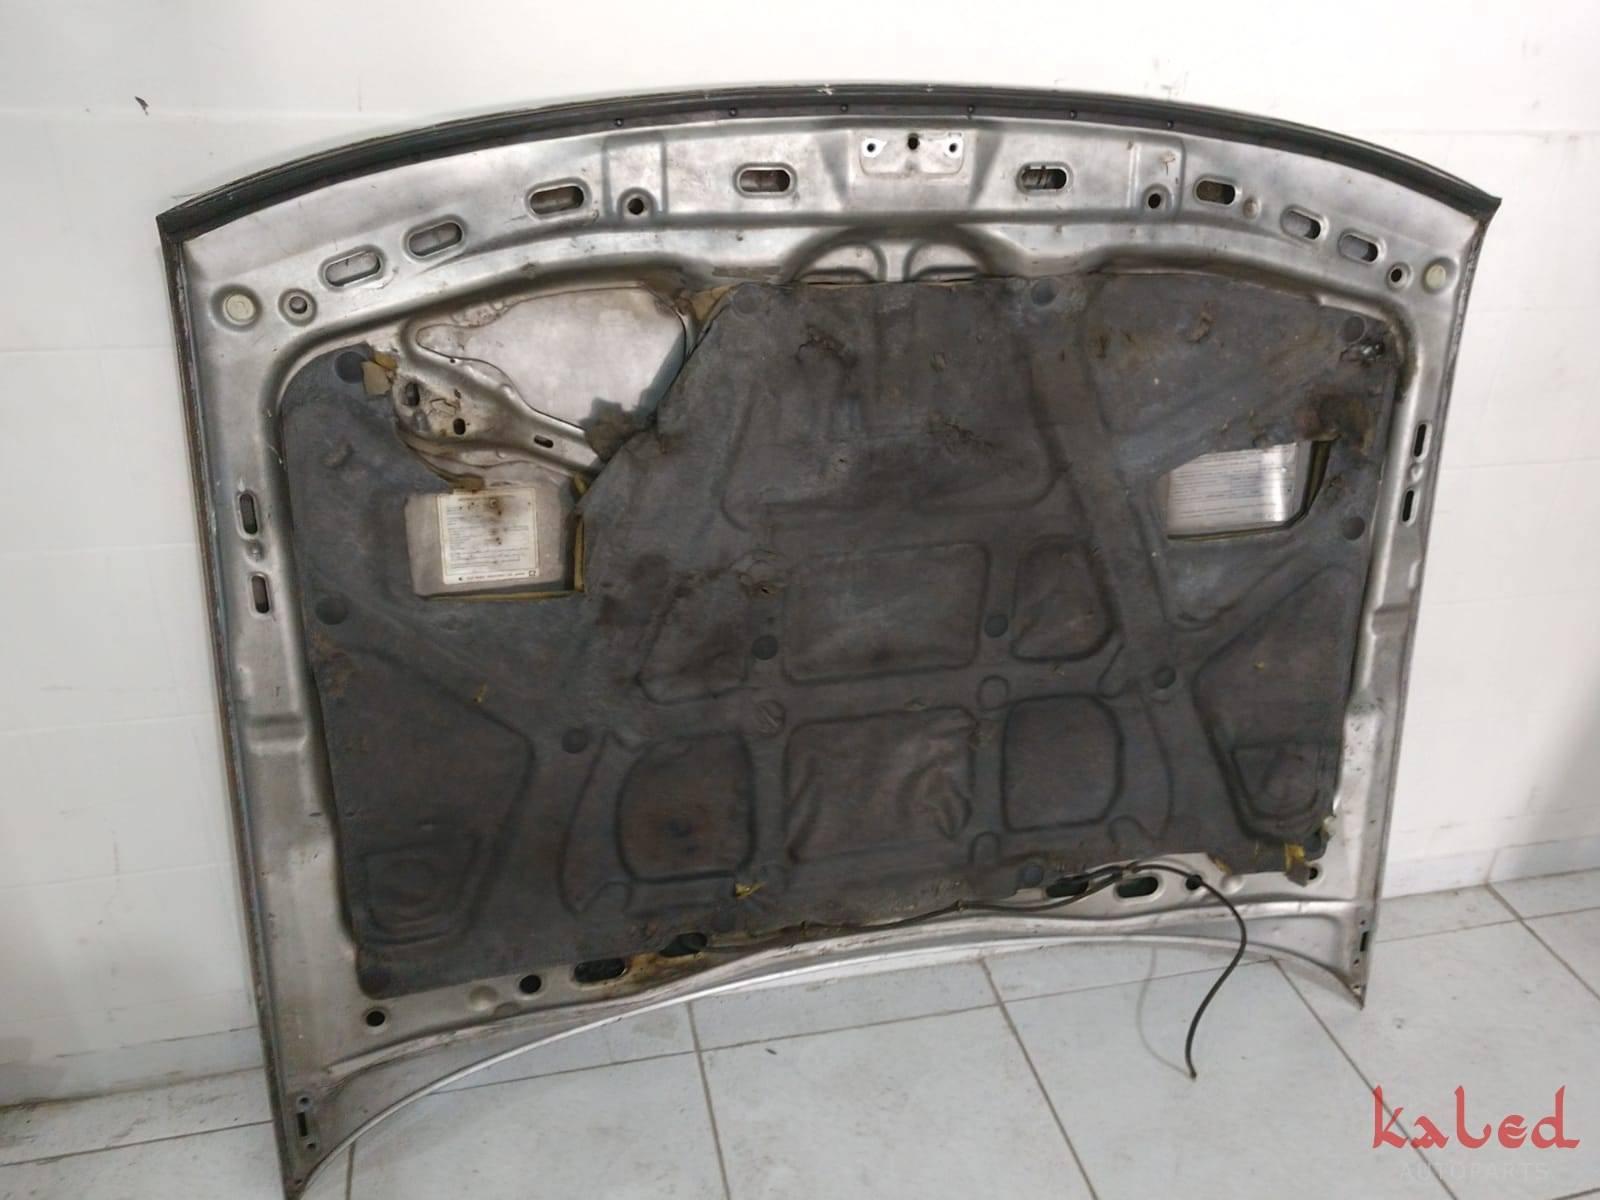 Capô Subaru Legacy 92/93 - Kaled Auto Parts